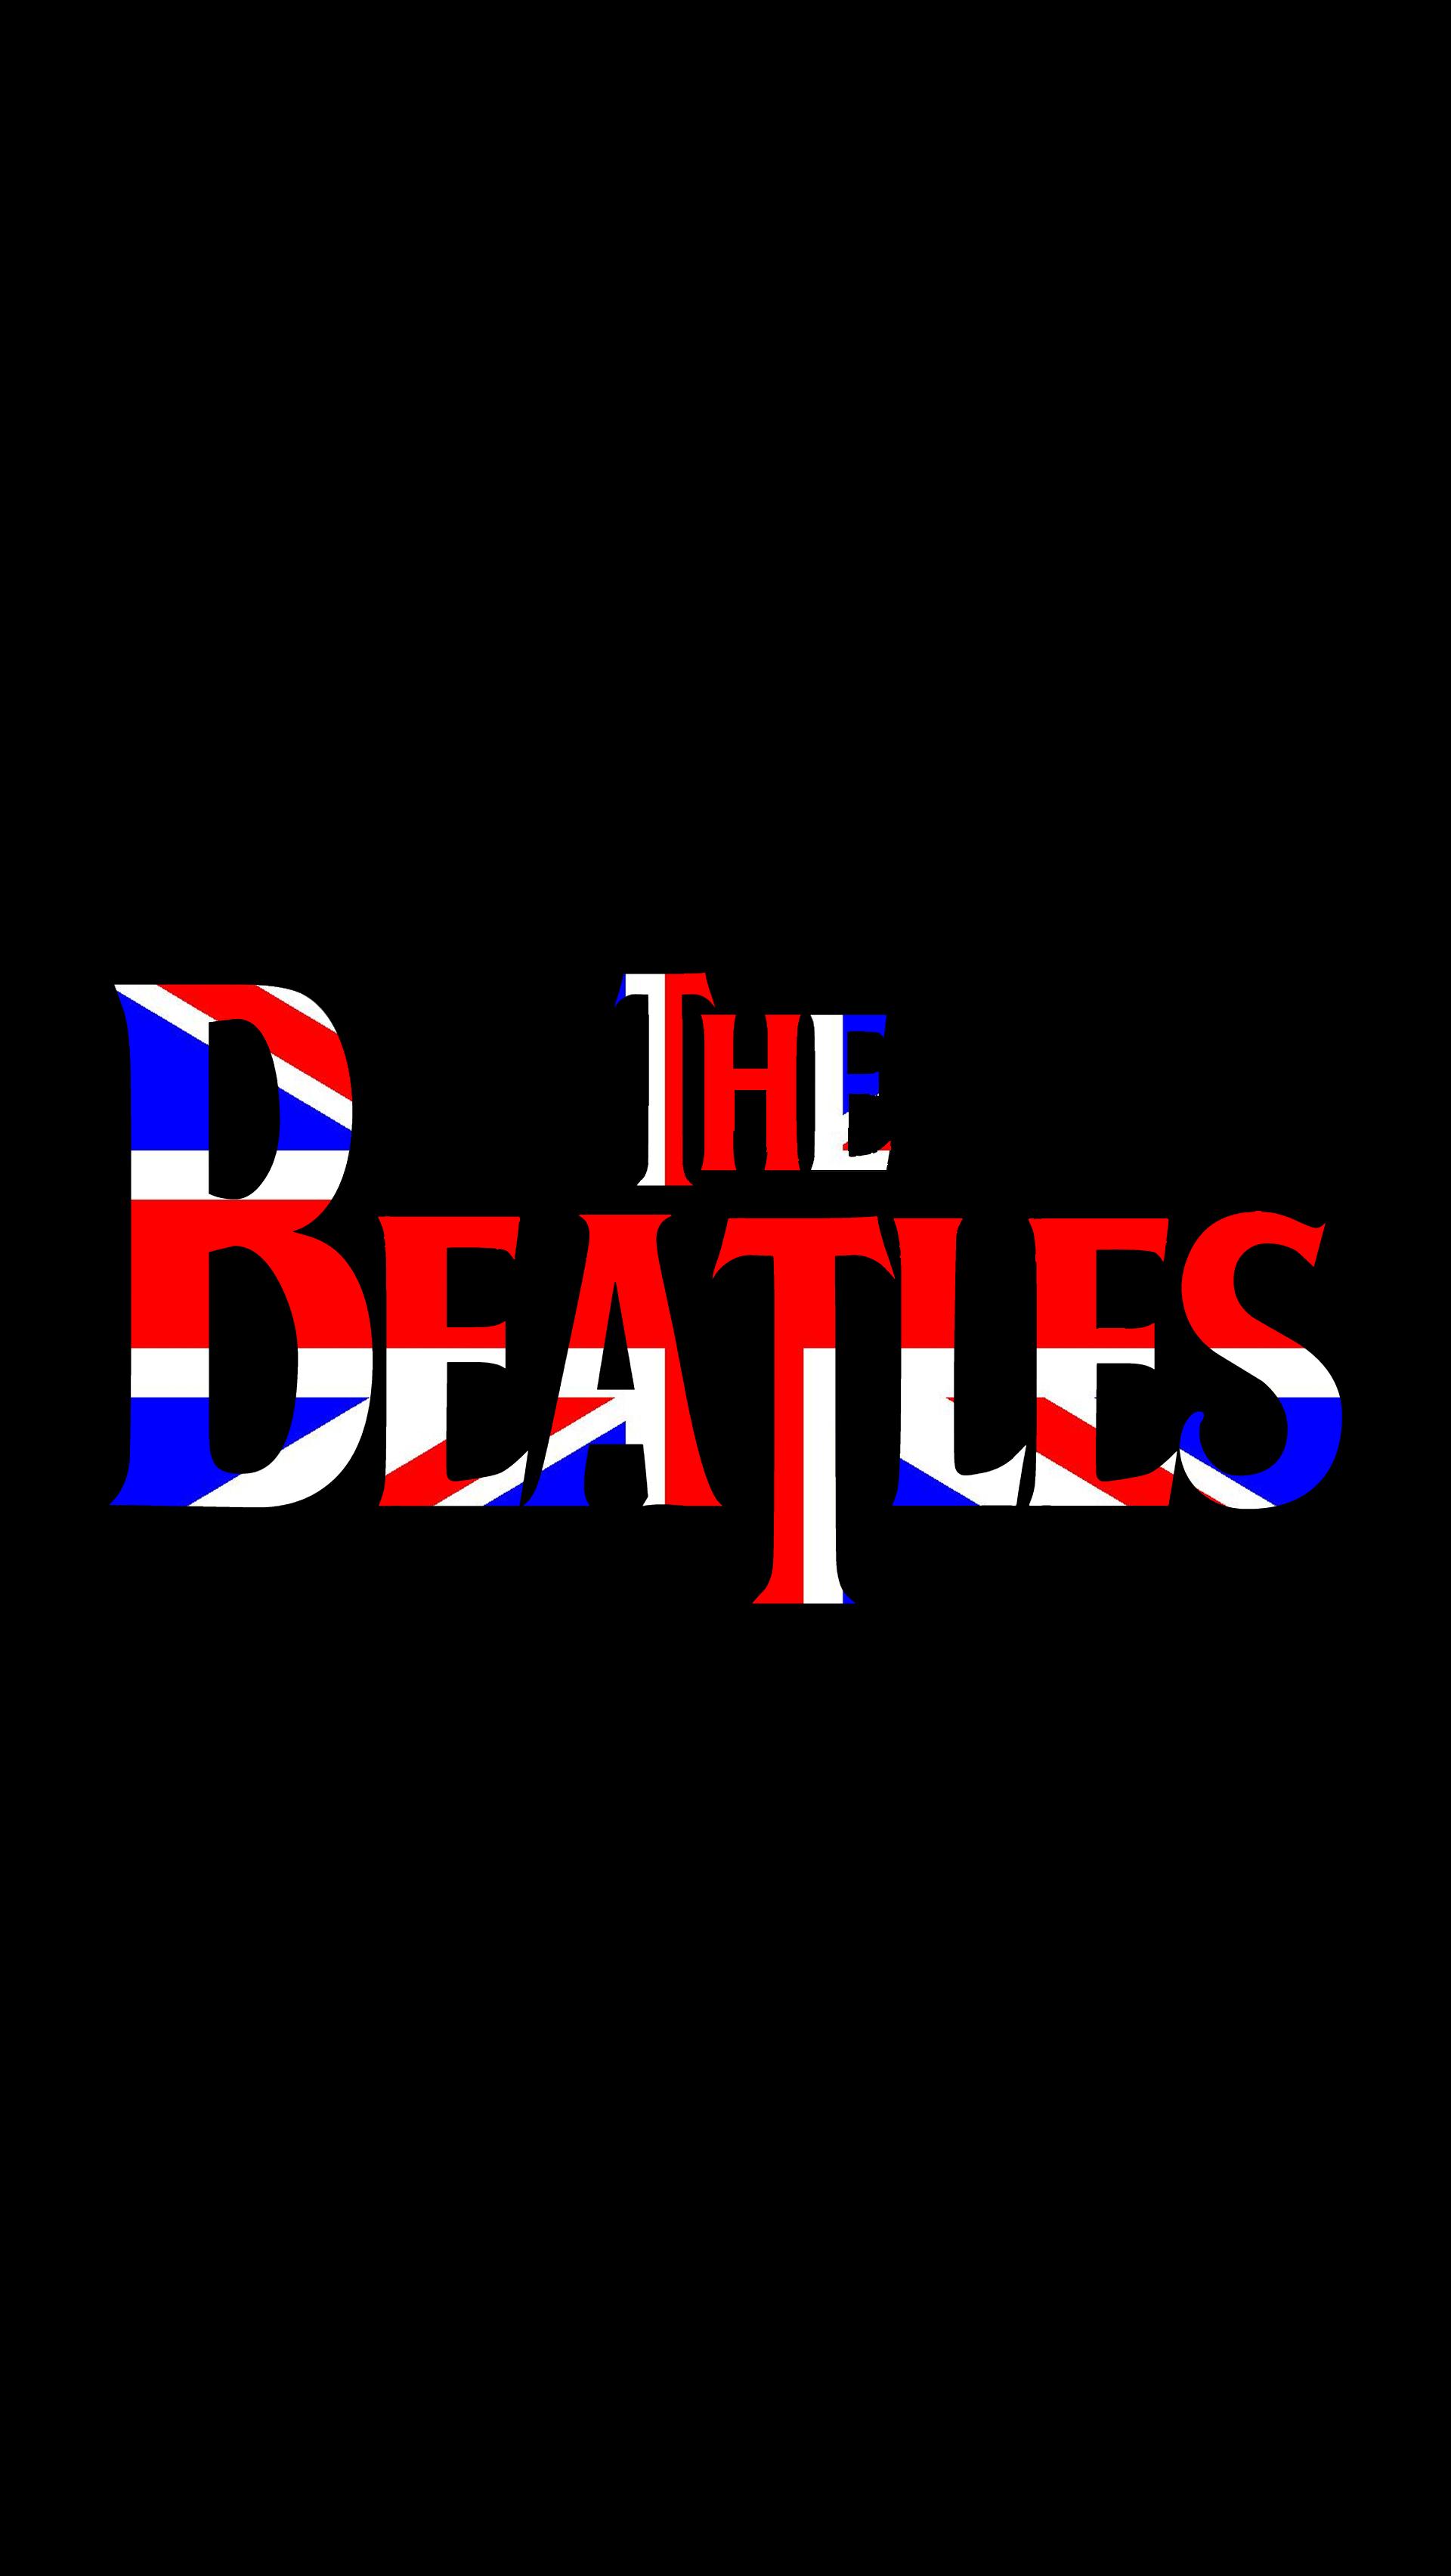 The Beatles Iphone 5 Wallpaper The Beatles